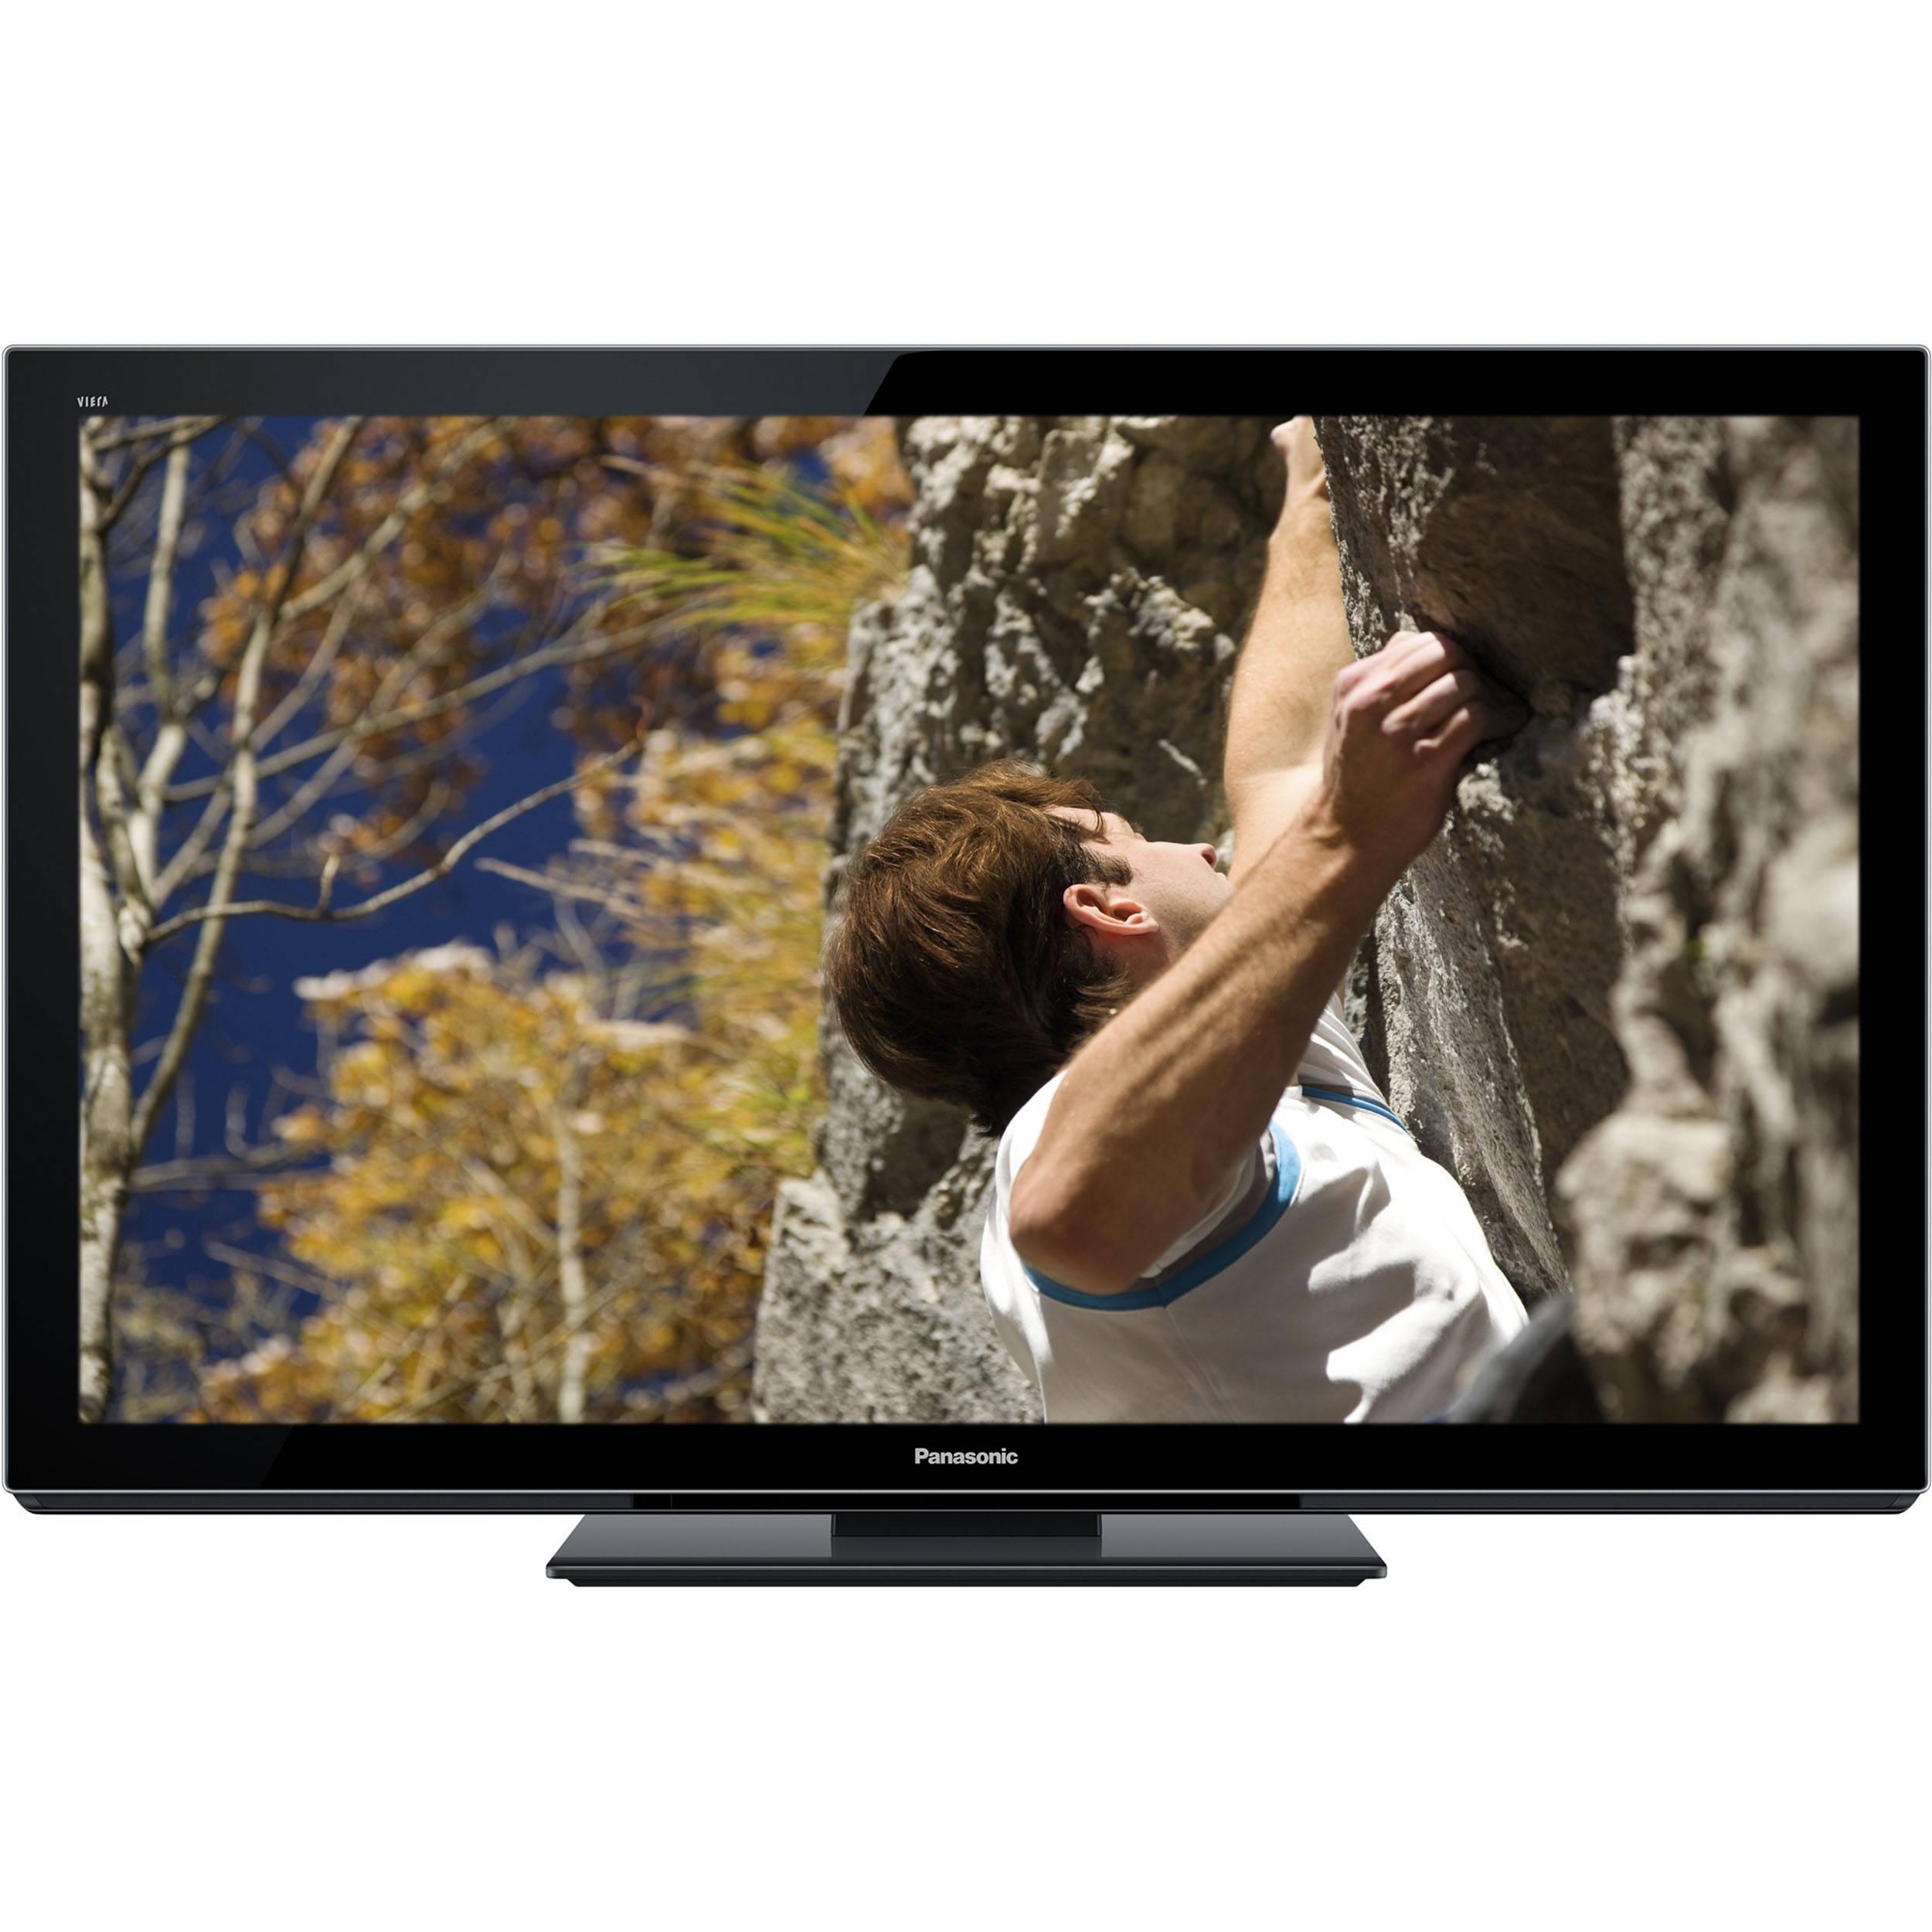 Panasonic TC-P65ST30 Smart TV Windows 8